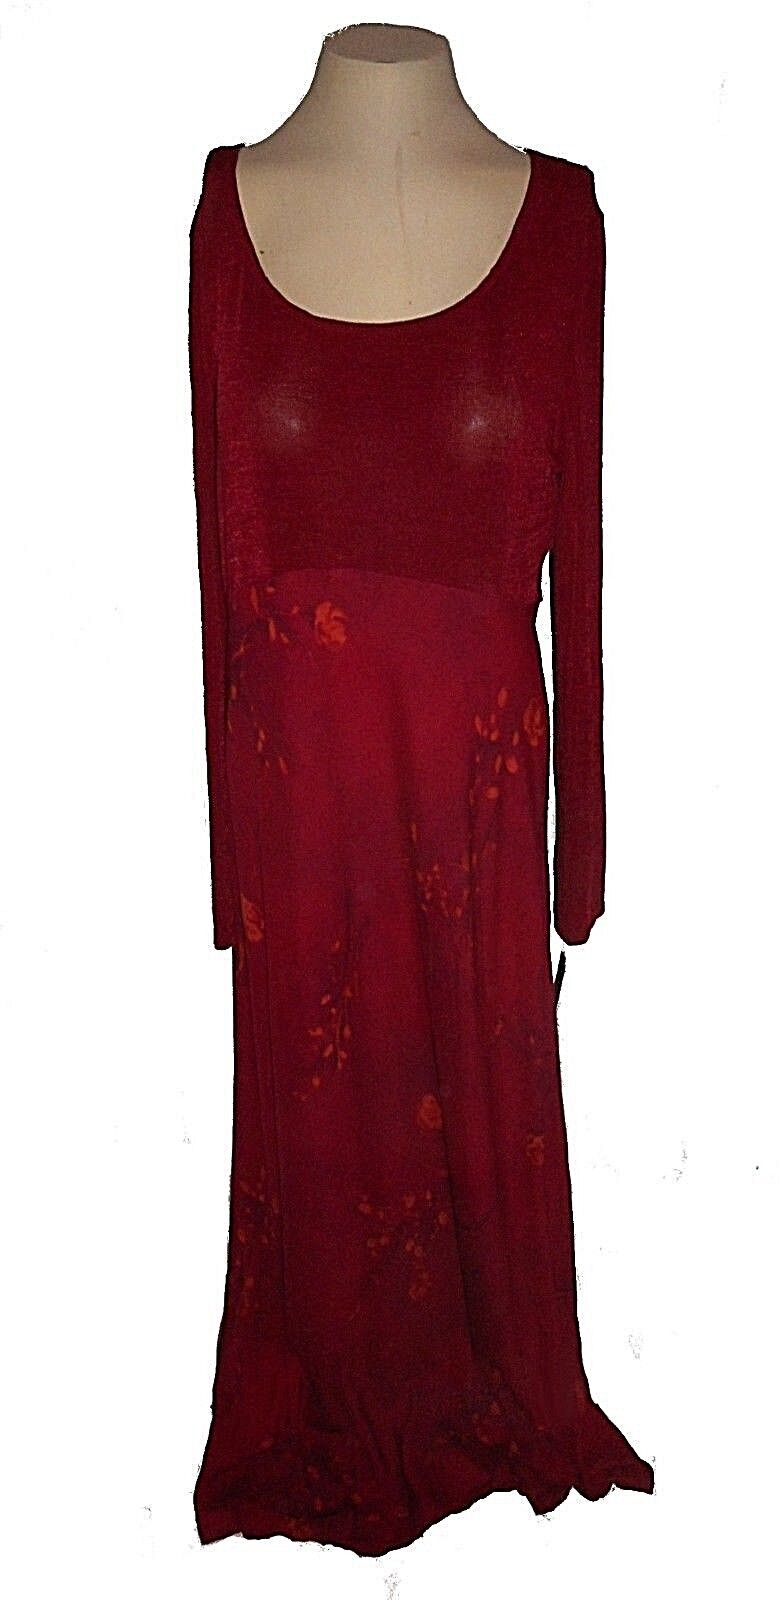 New Dress, St. Tropez West, Park Avenue Wine-Red Floral Stretch Knit Long  10